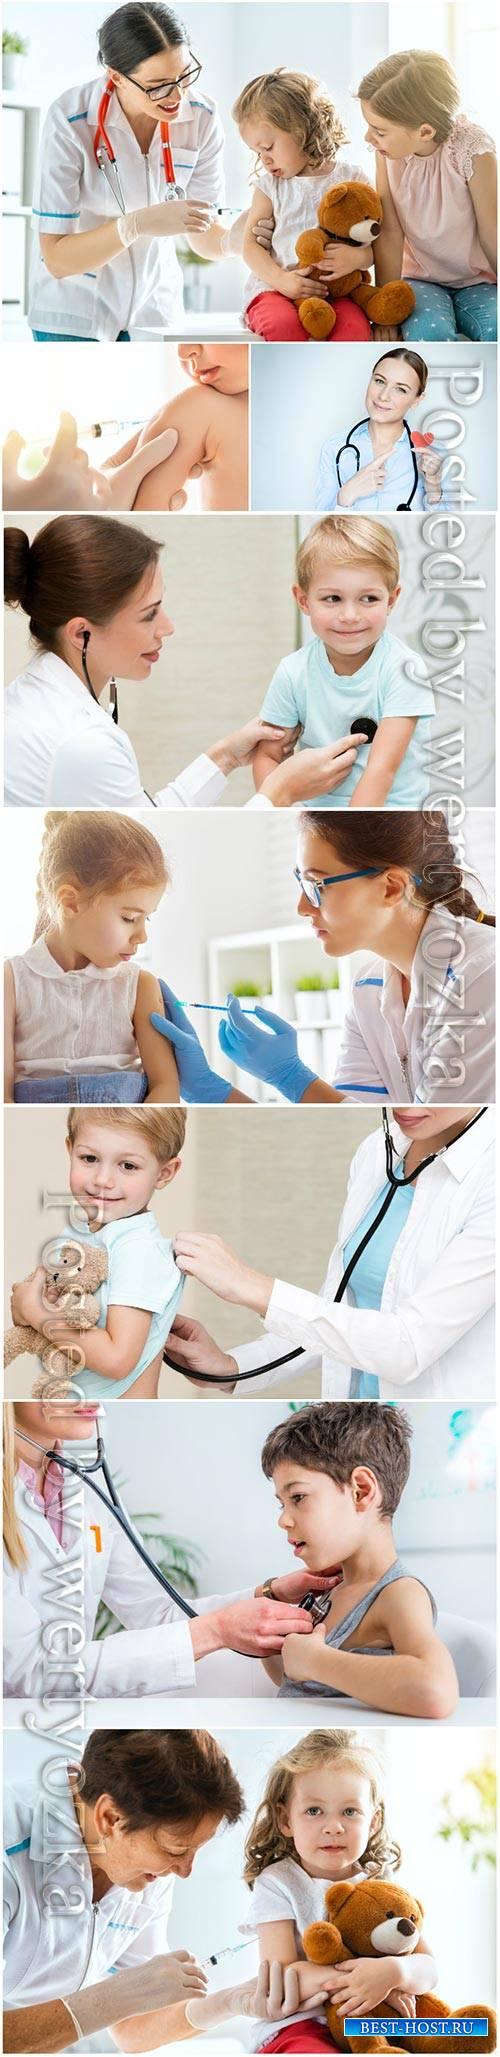 Children's doctor and children stock photo